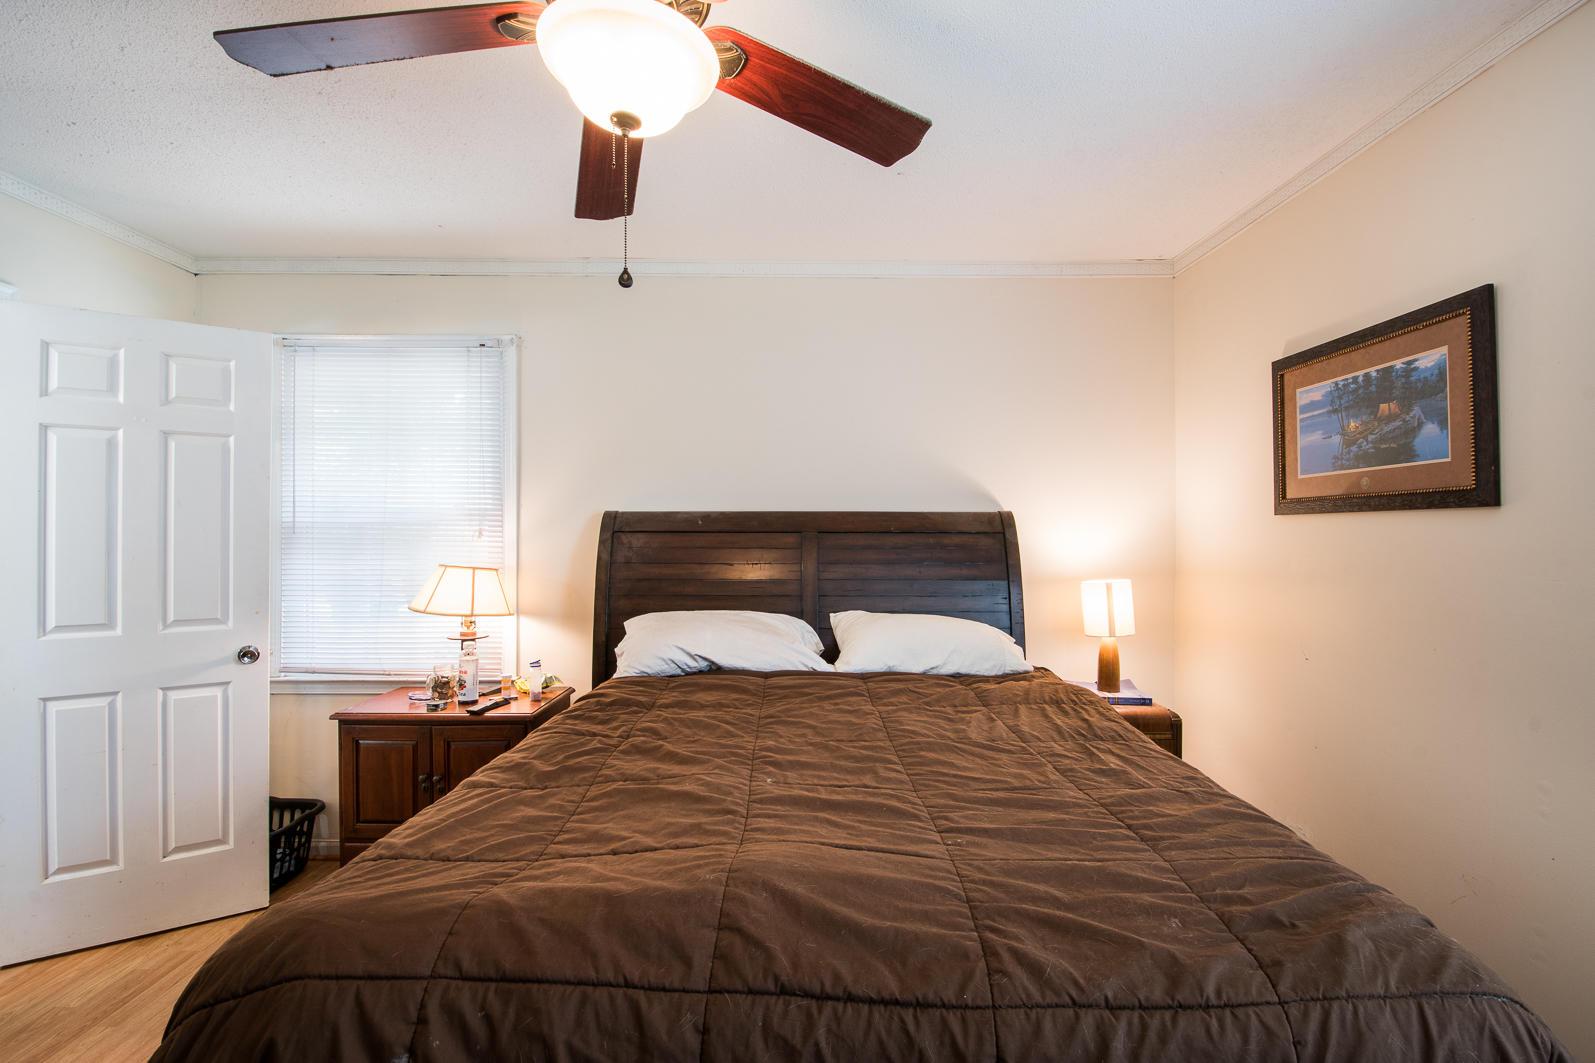 Wando East Homes For Sale - 1605 Babington, Mount Pleasant, SC - 20